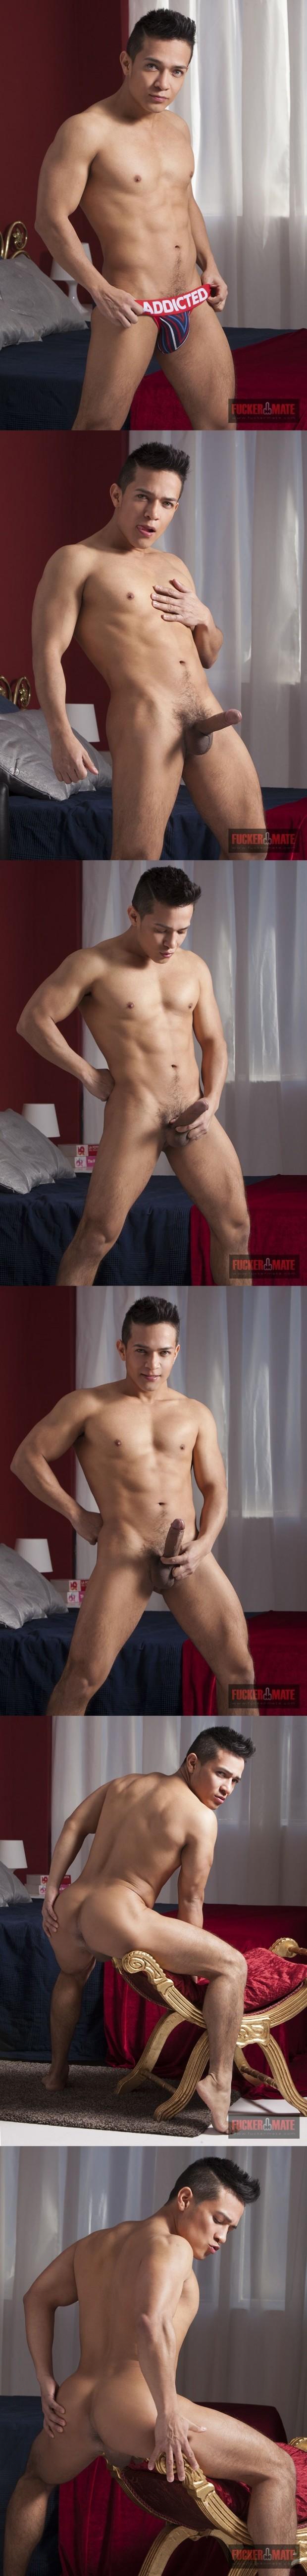 Ricky-Ibanez